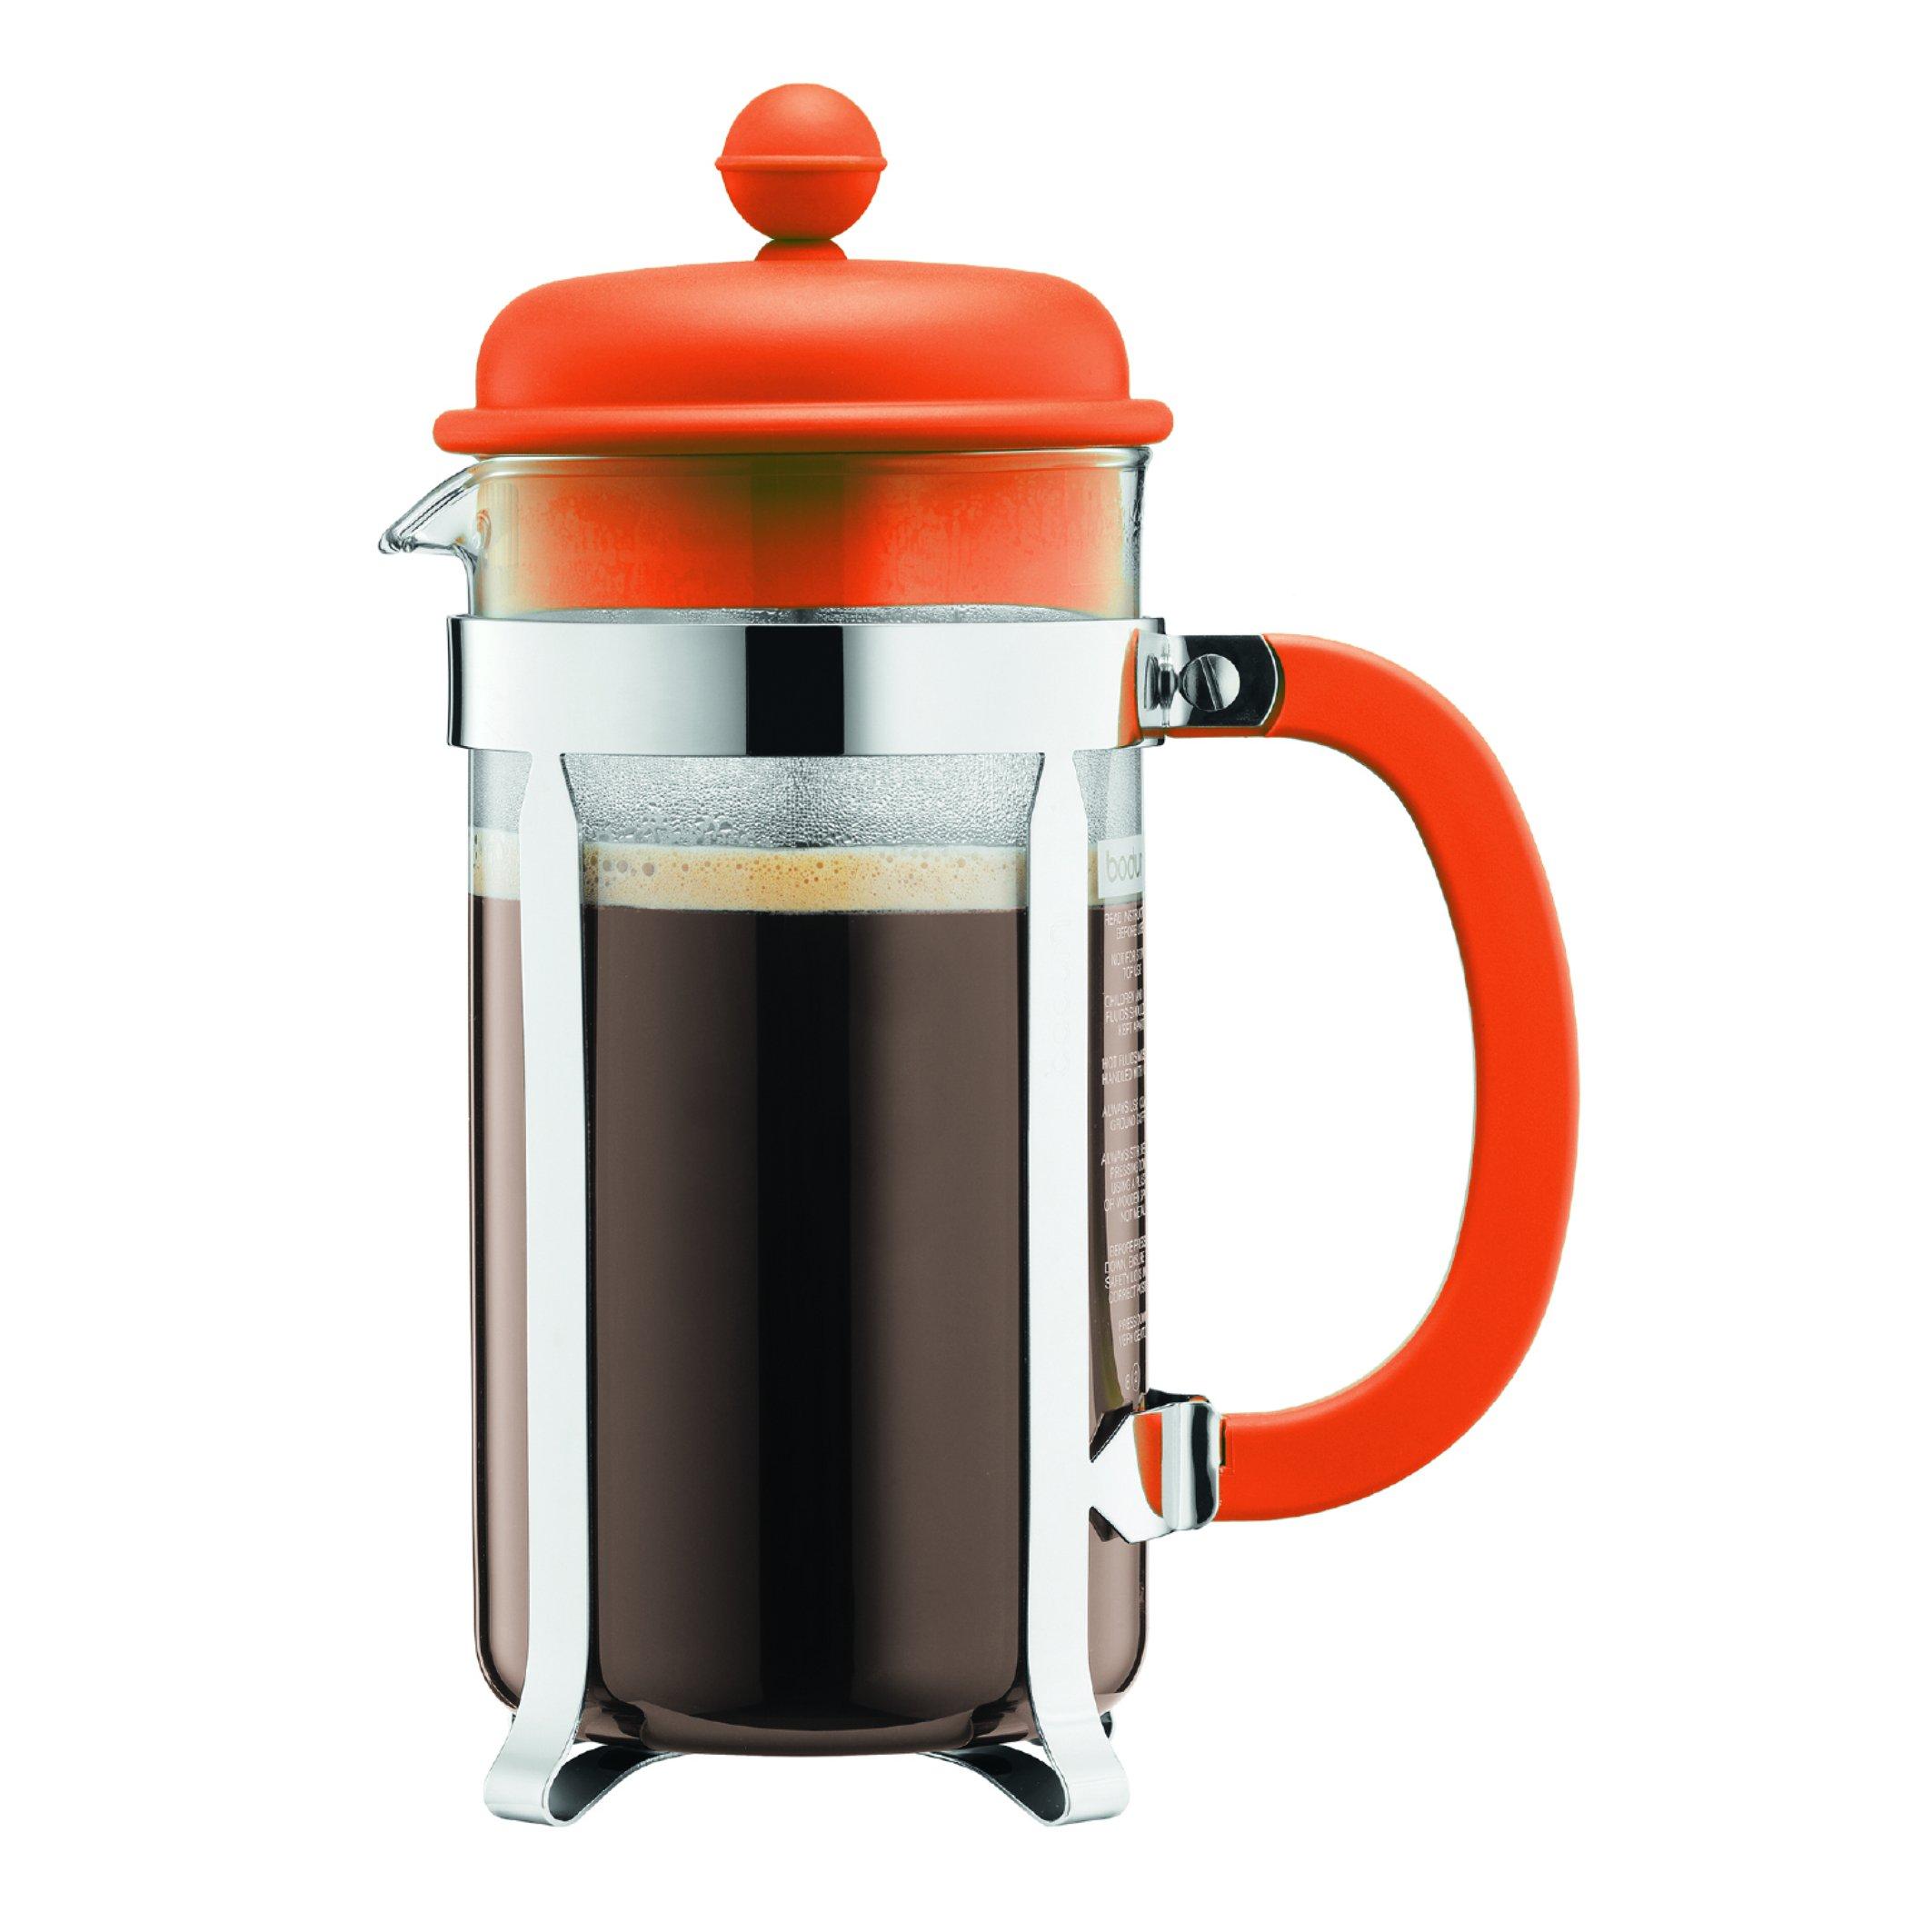 Bodum CAFFETTIERA Coffee Maker, 0.35 L - Orange